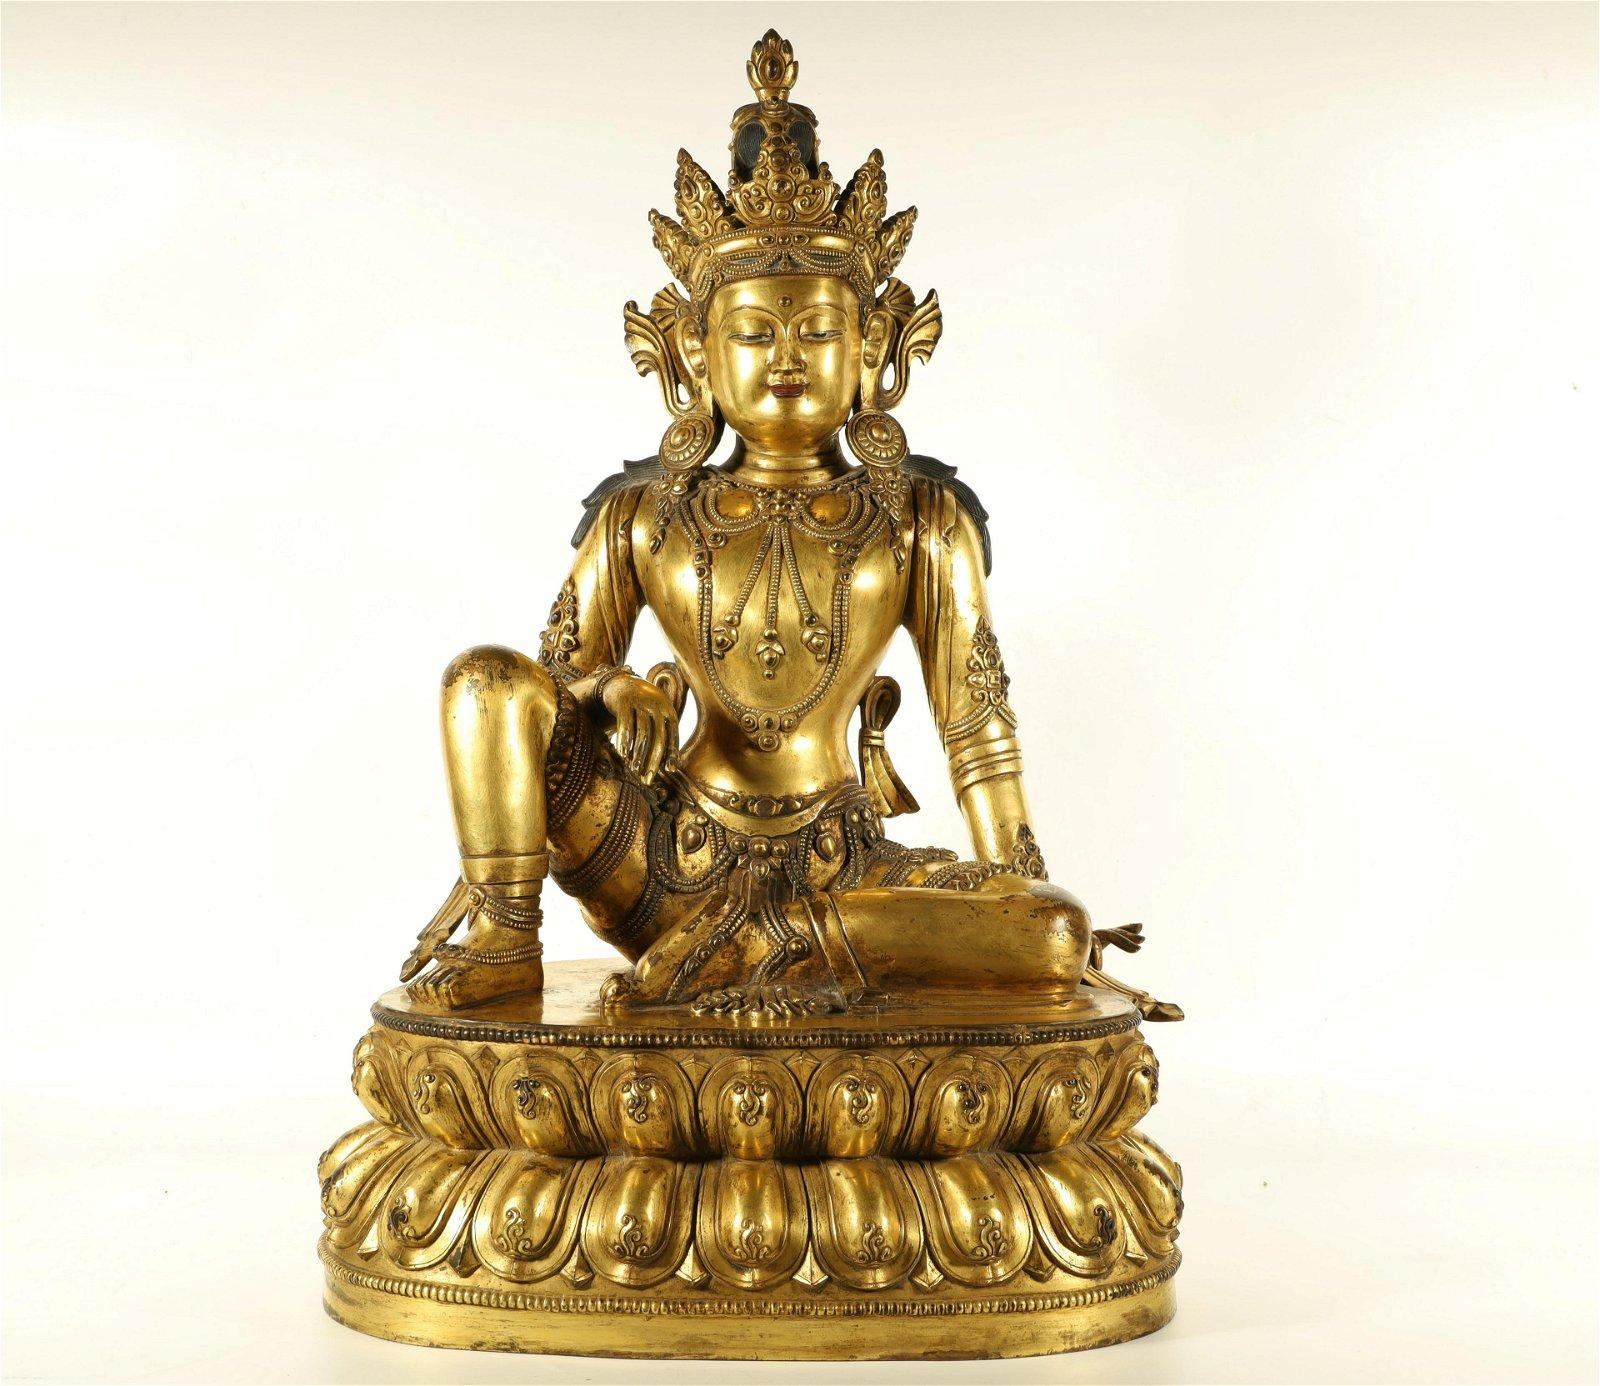 A Rare Gild-bronze Figure Of Buddha